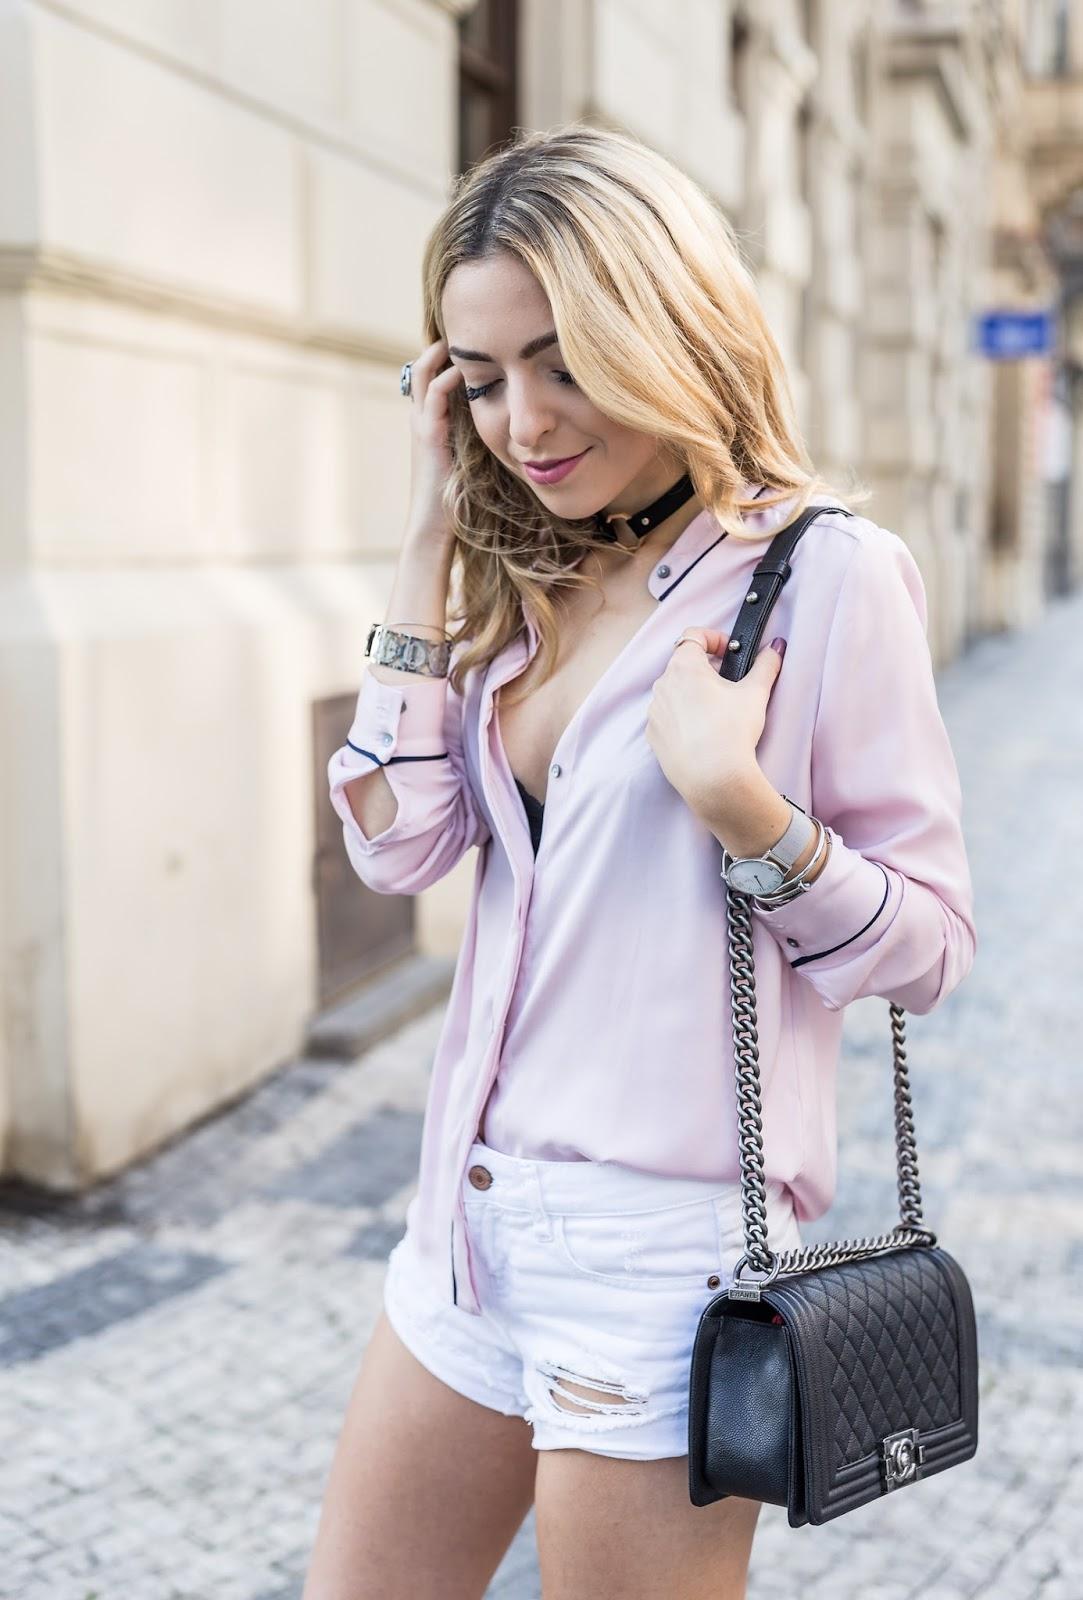 Streetstyle Pyjama Shirt Chanel Boy Bag Caviar Outfit